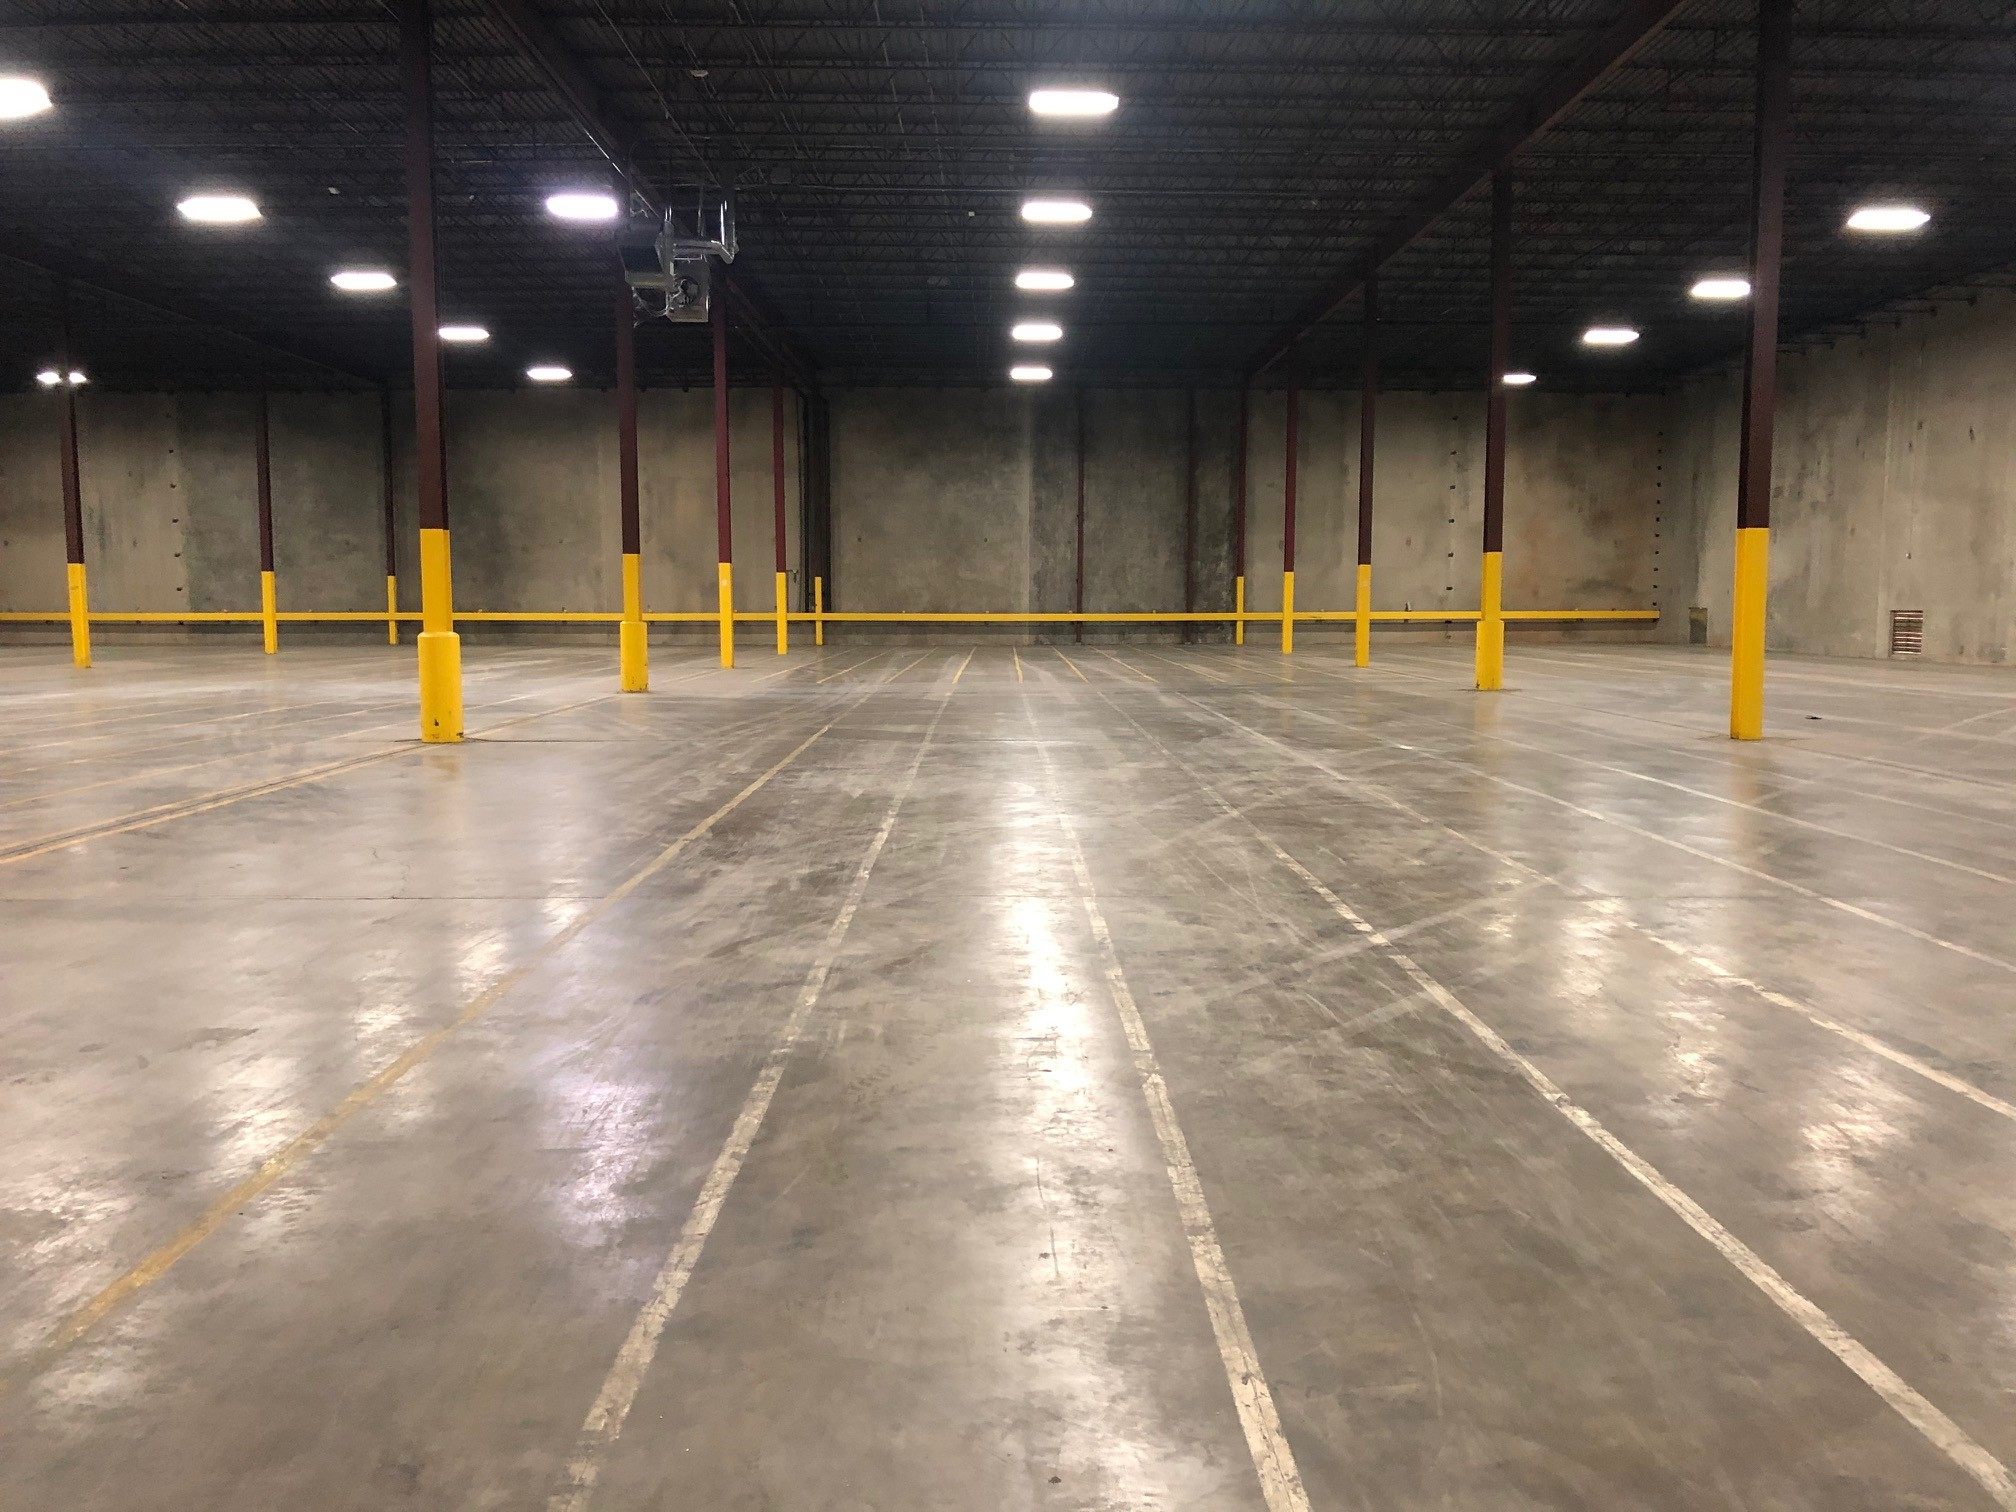 https://www.teamweston.com/wp-content/uploads/2021/01/warehouse-8.jpg